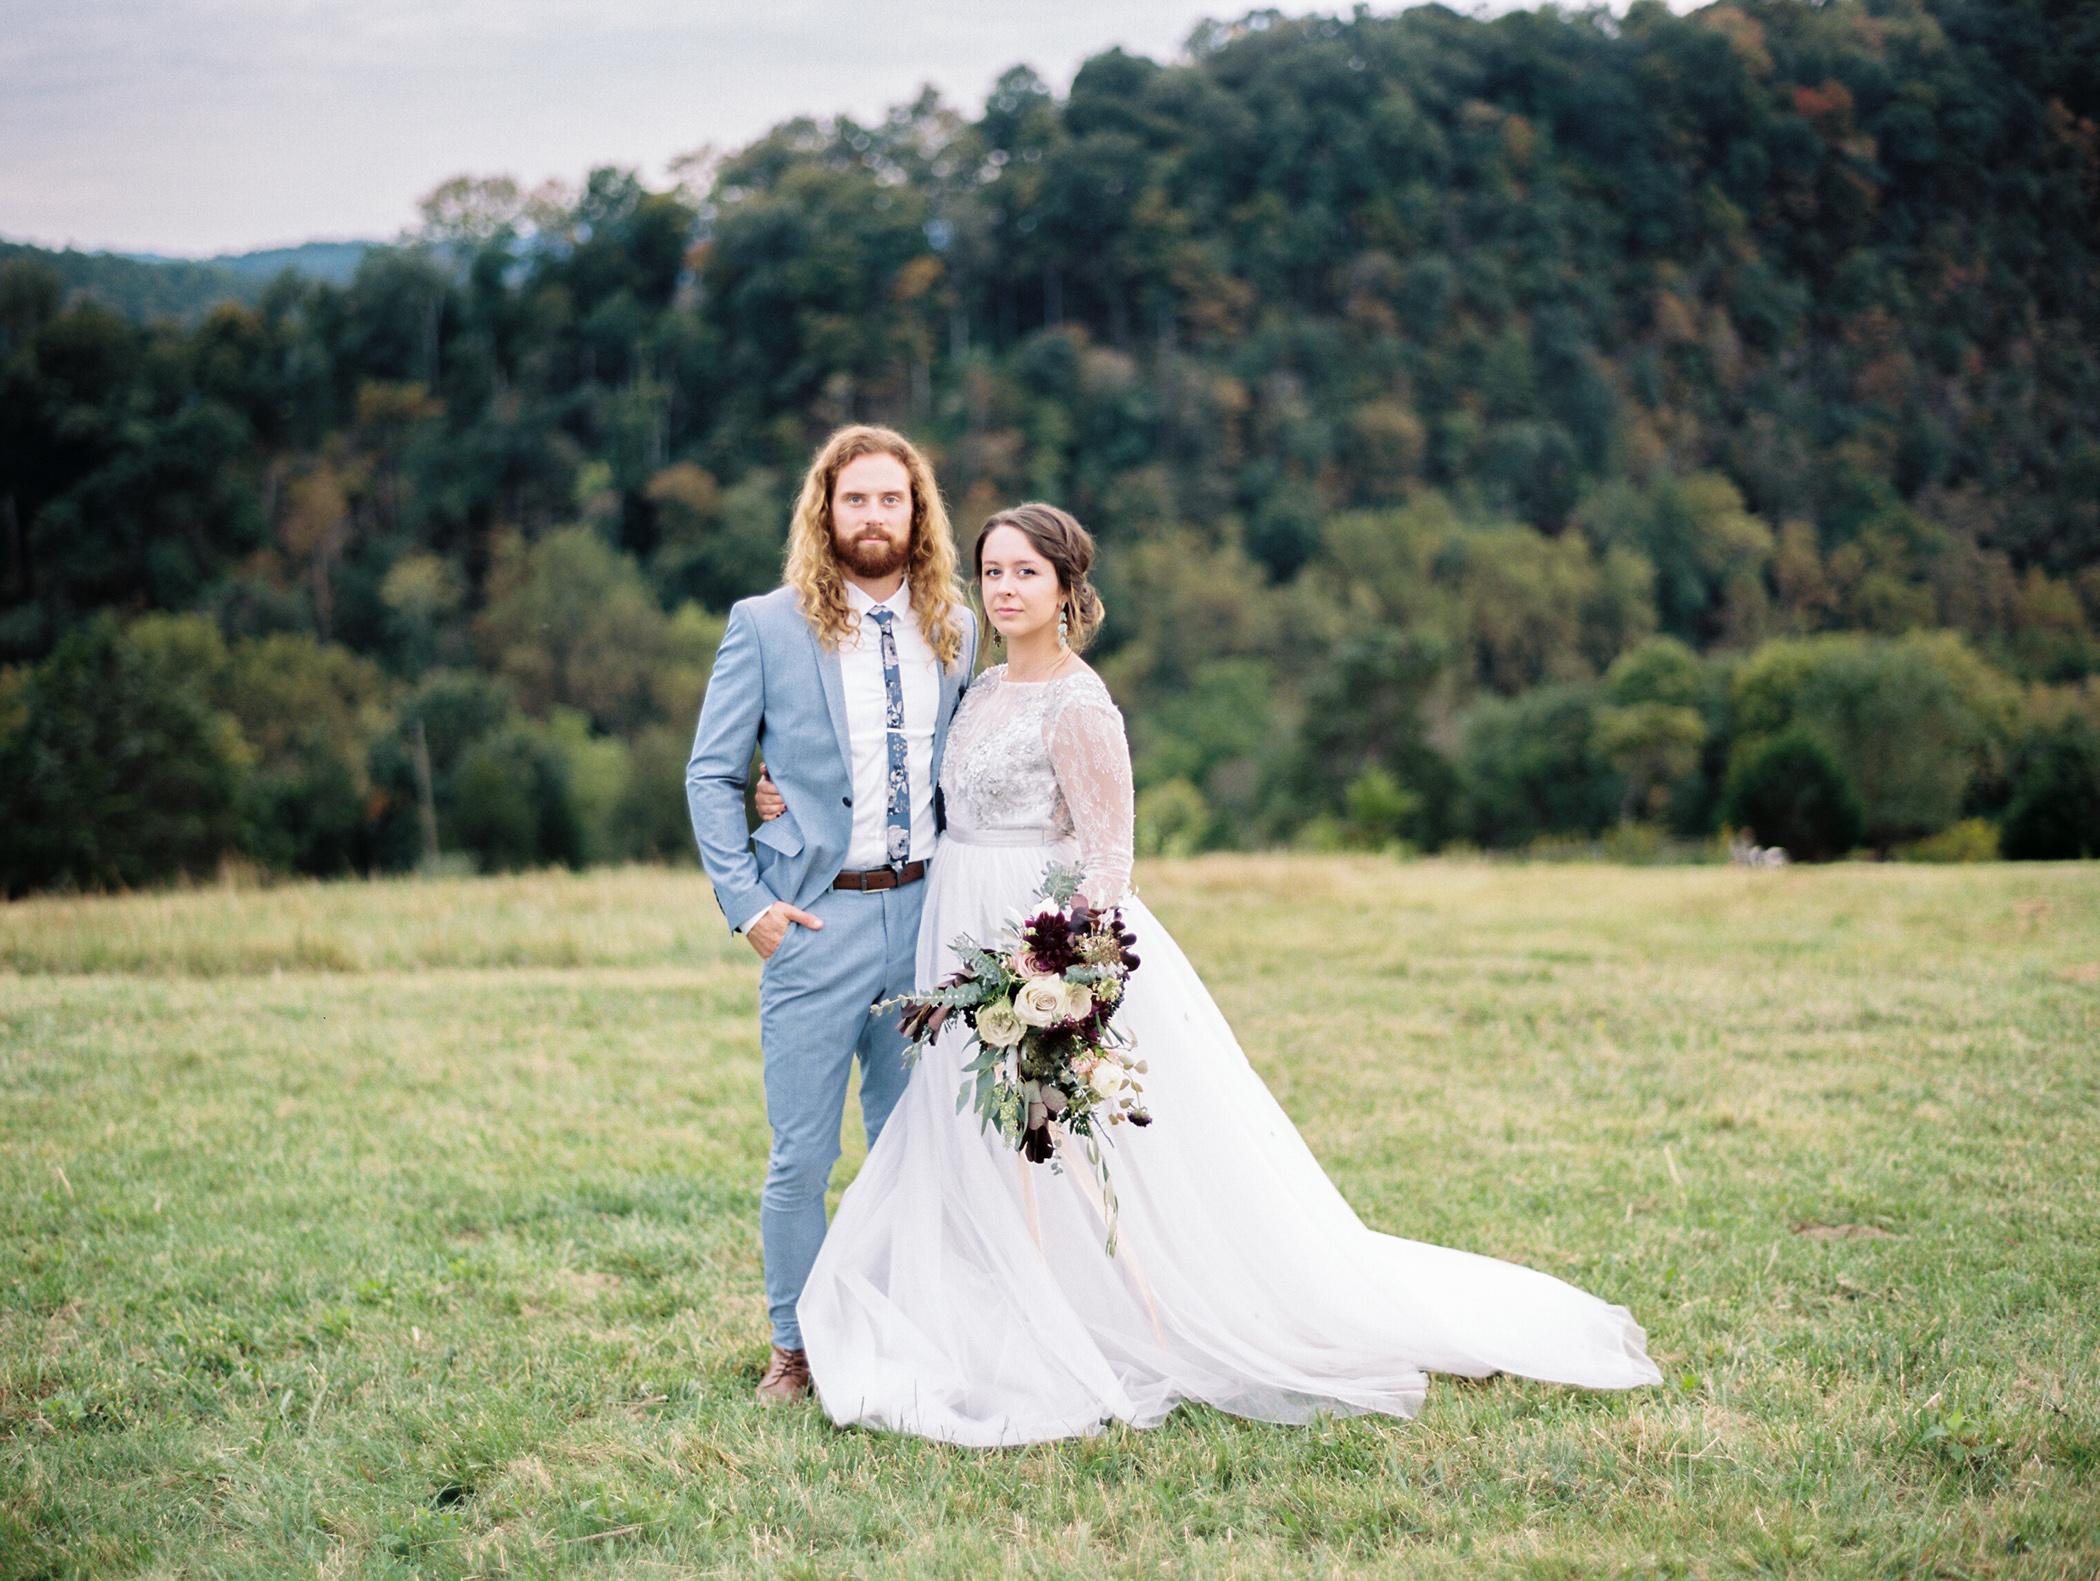 Charlotte-Film-Wedding_Photographer-heartstone-lodge-virginia-31.jpg